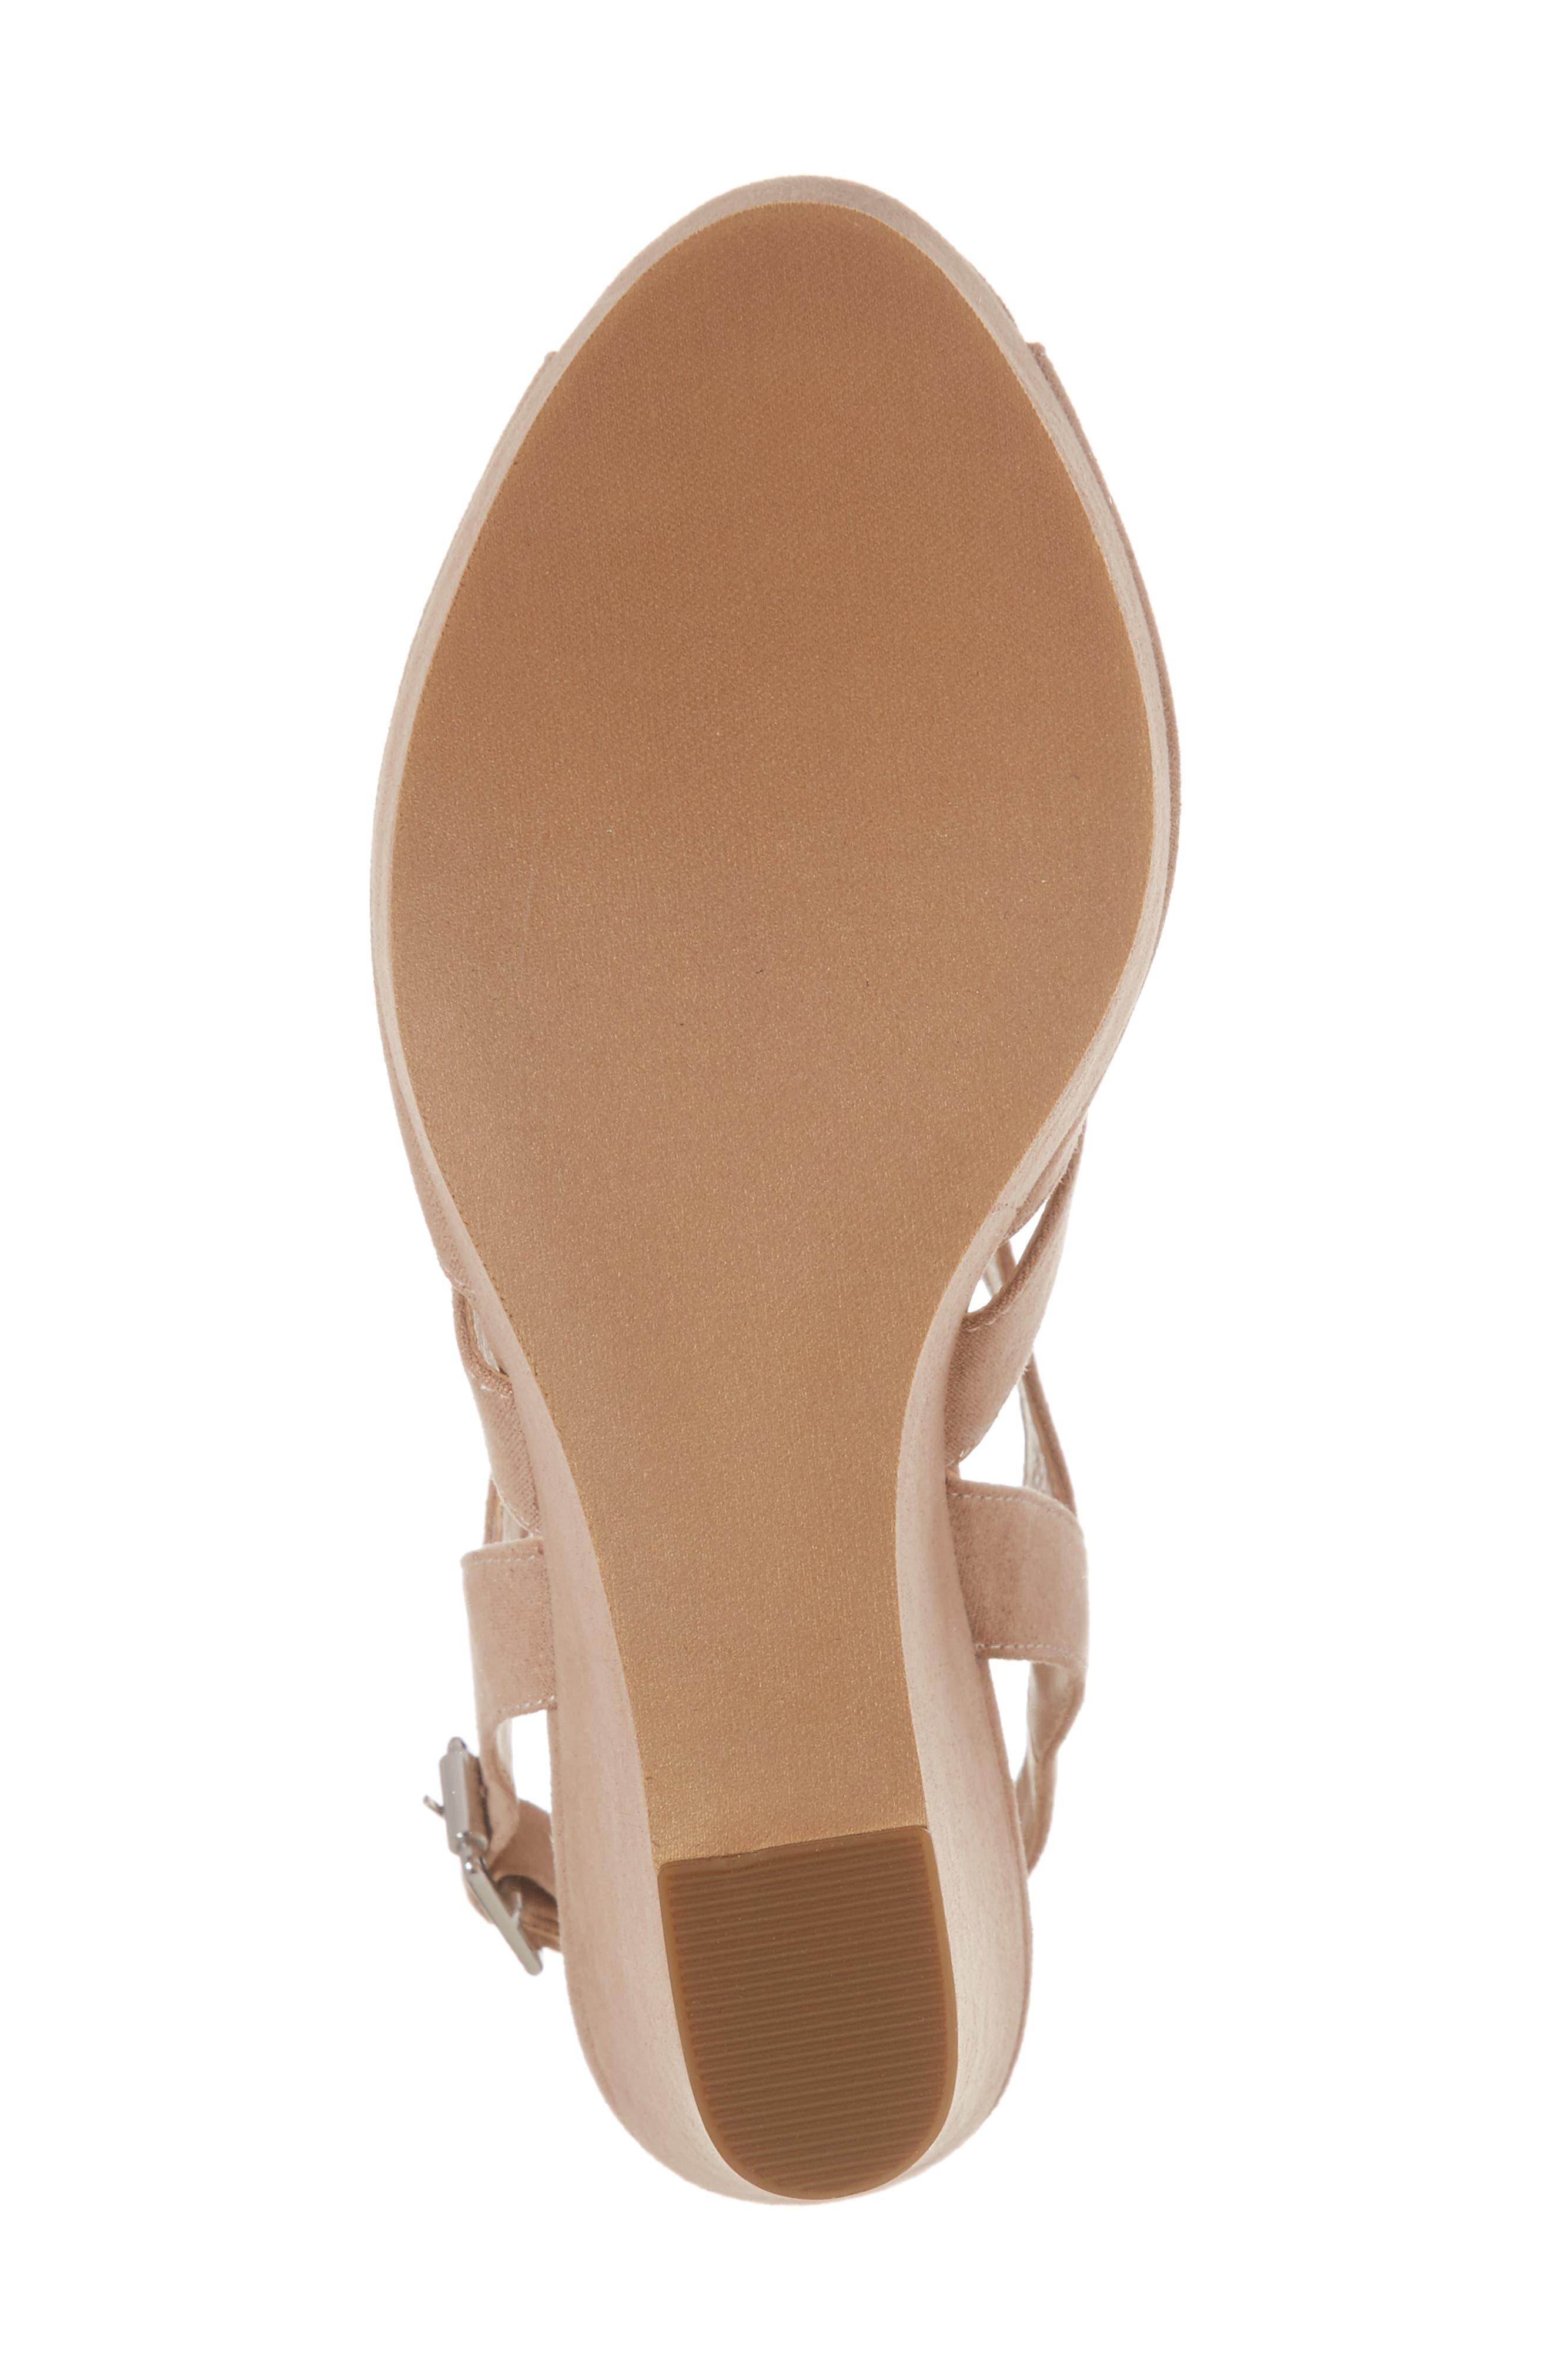 Sunny Platform Wedge Sandal,                             Alternate thumbnail 6, color,                             Nude Faux Suede